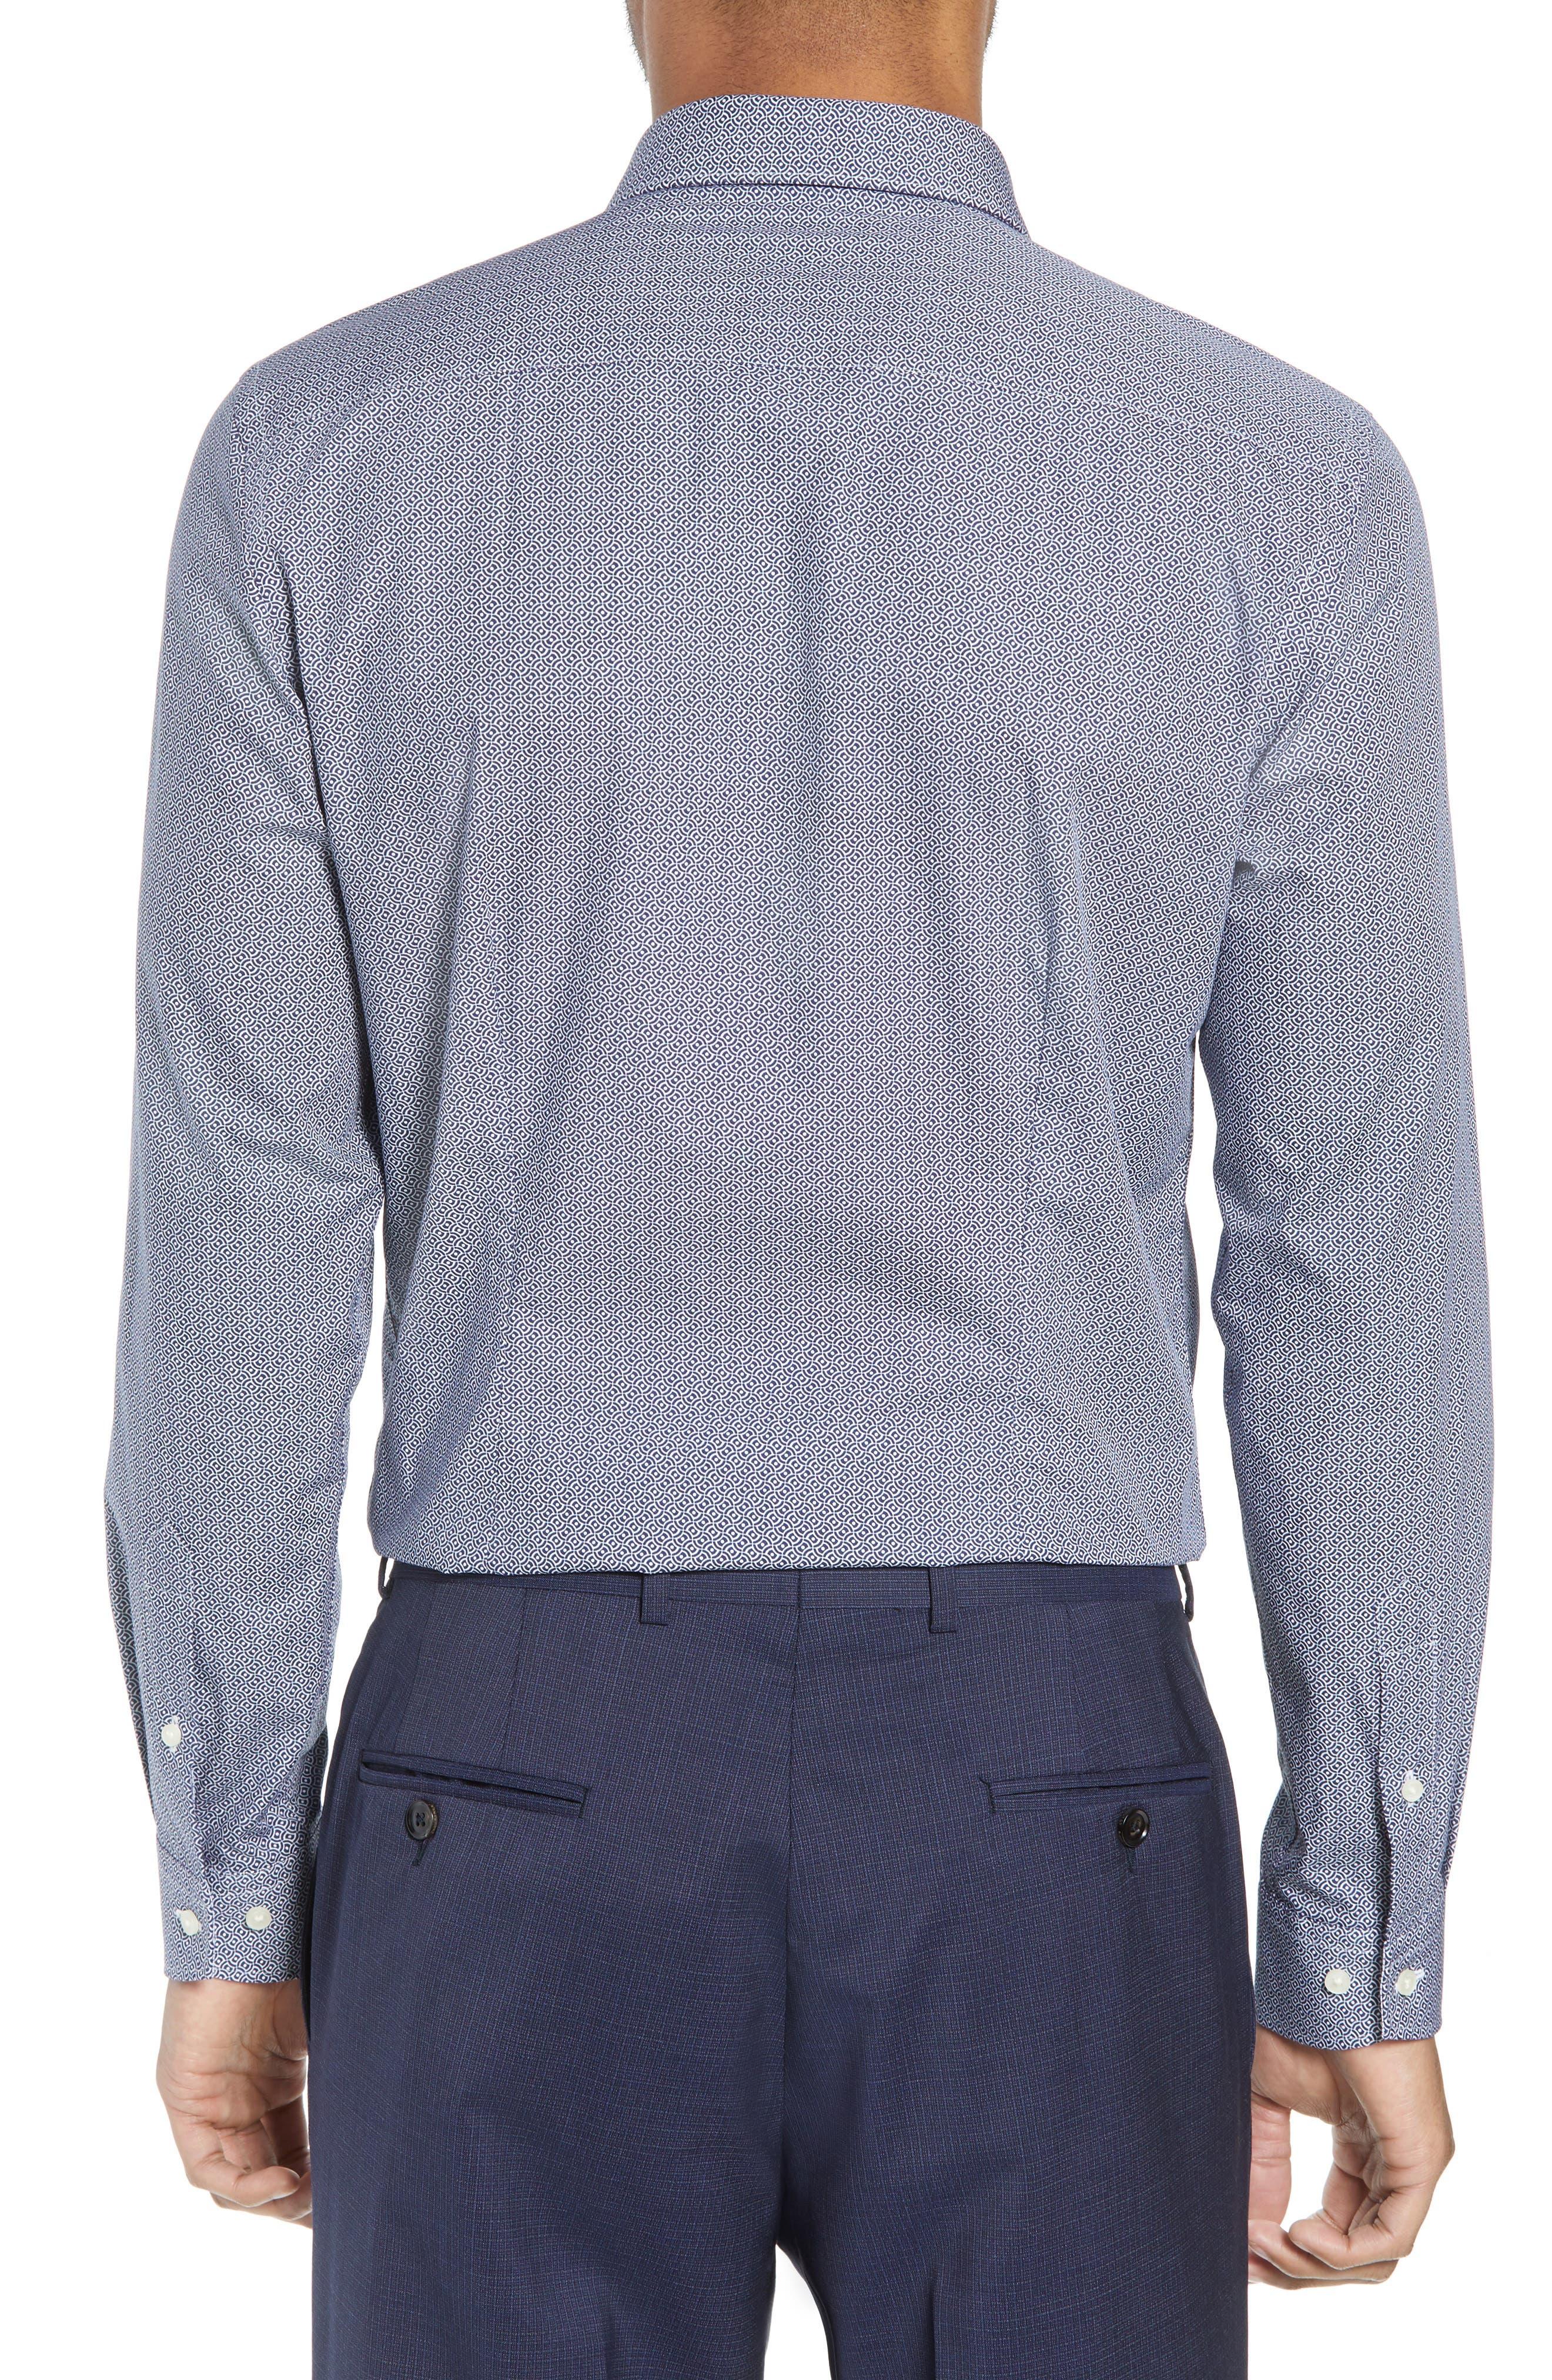 Footz Slim Fit Geometric Dress Shirt,                             Alternate thumbnail 3, color,                             NAVY